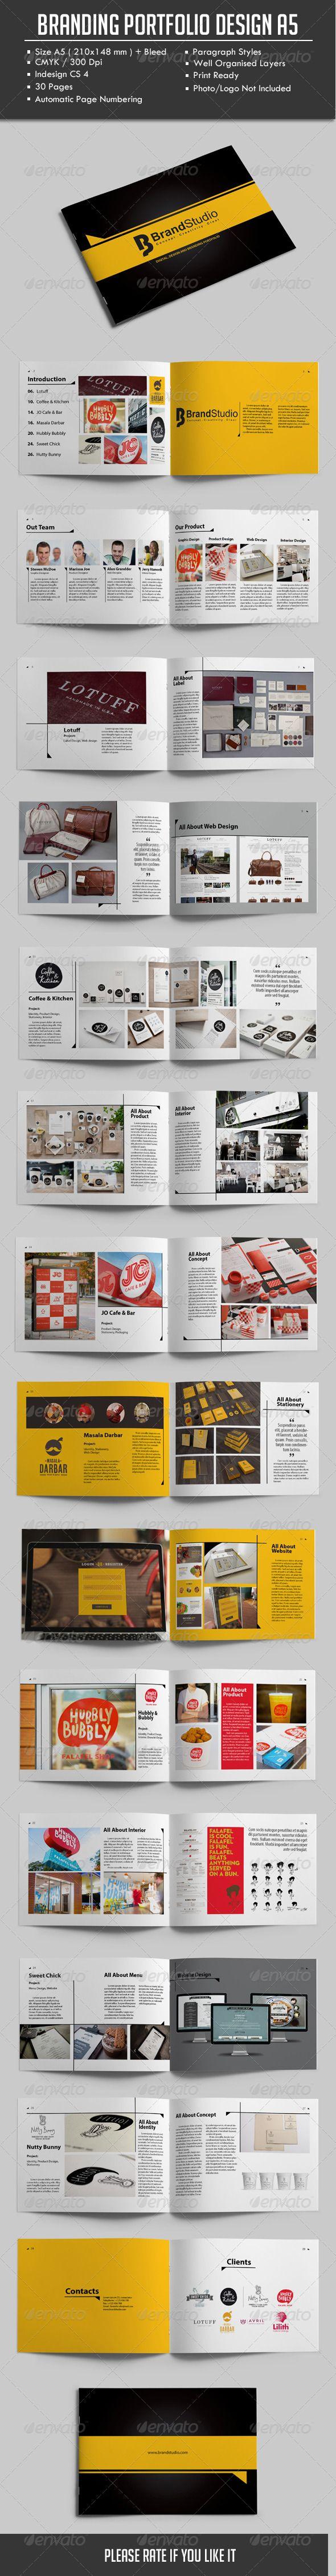 Branding Portfolio Design A5. Details30 Pages Indesign CS 4 Print Ready A5 Landscape (210148 mm)   bleed 300 dpi / CMYK Automatic